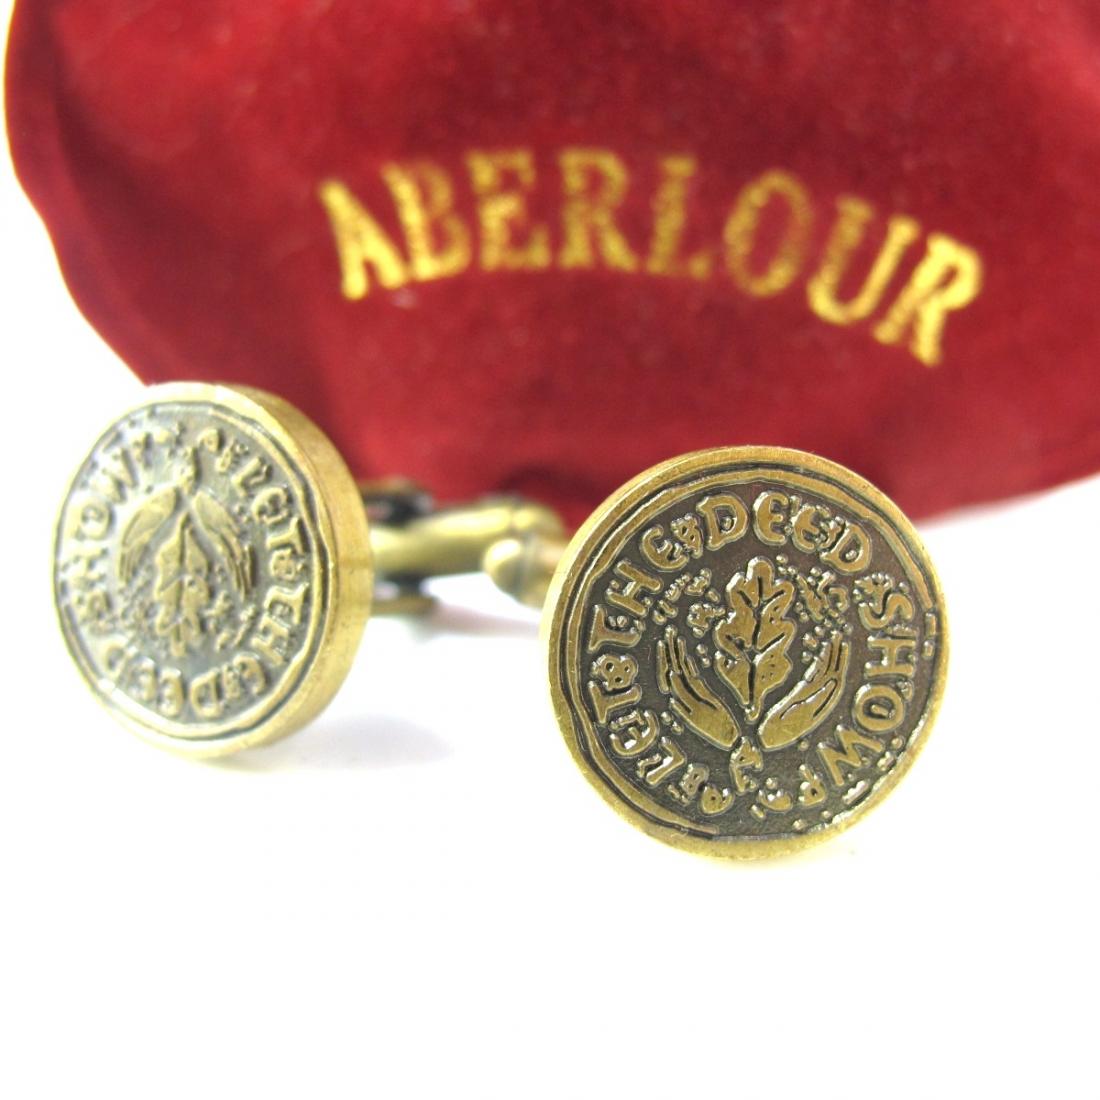 Aberlour 10 Year Old 1990s / Including Cufflinks